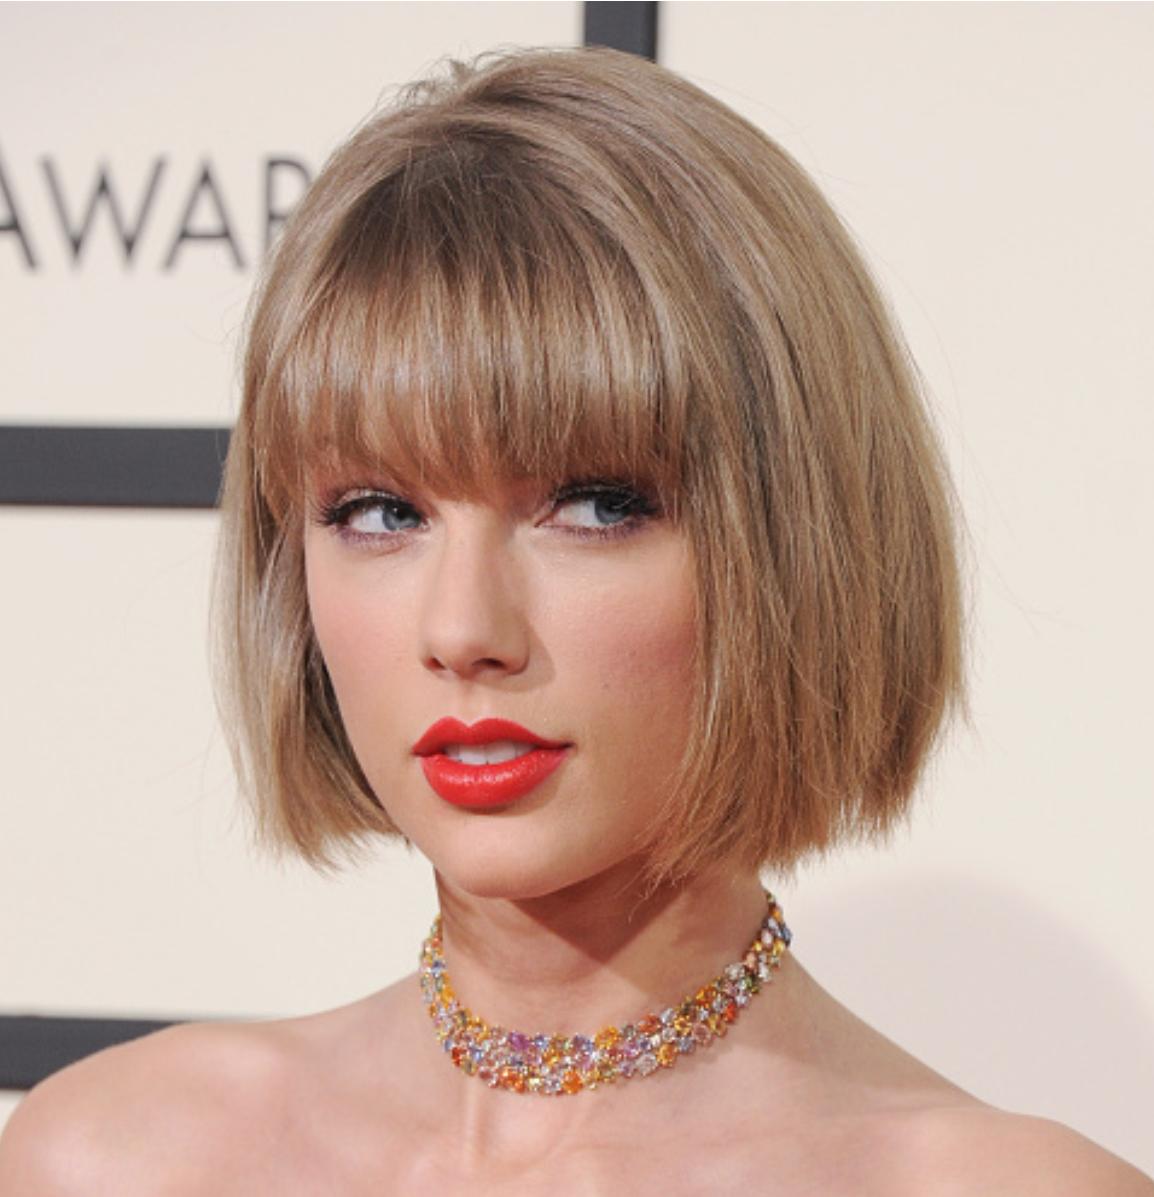 Taylor Swift Short Bob With Straight Bangs Short Hair With Bangs Short Bob Hairstyles Bob Hairstyles